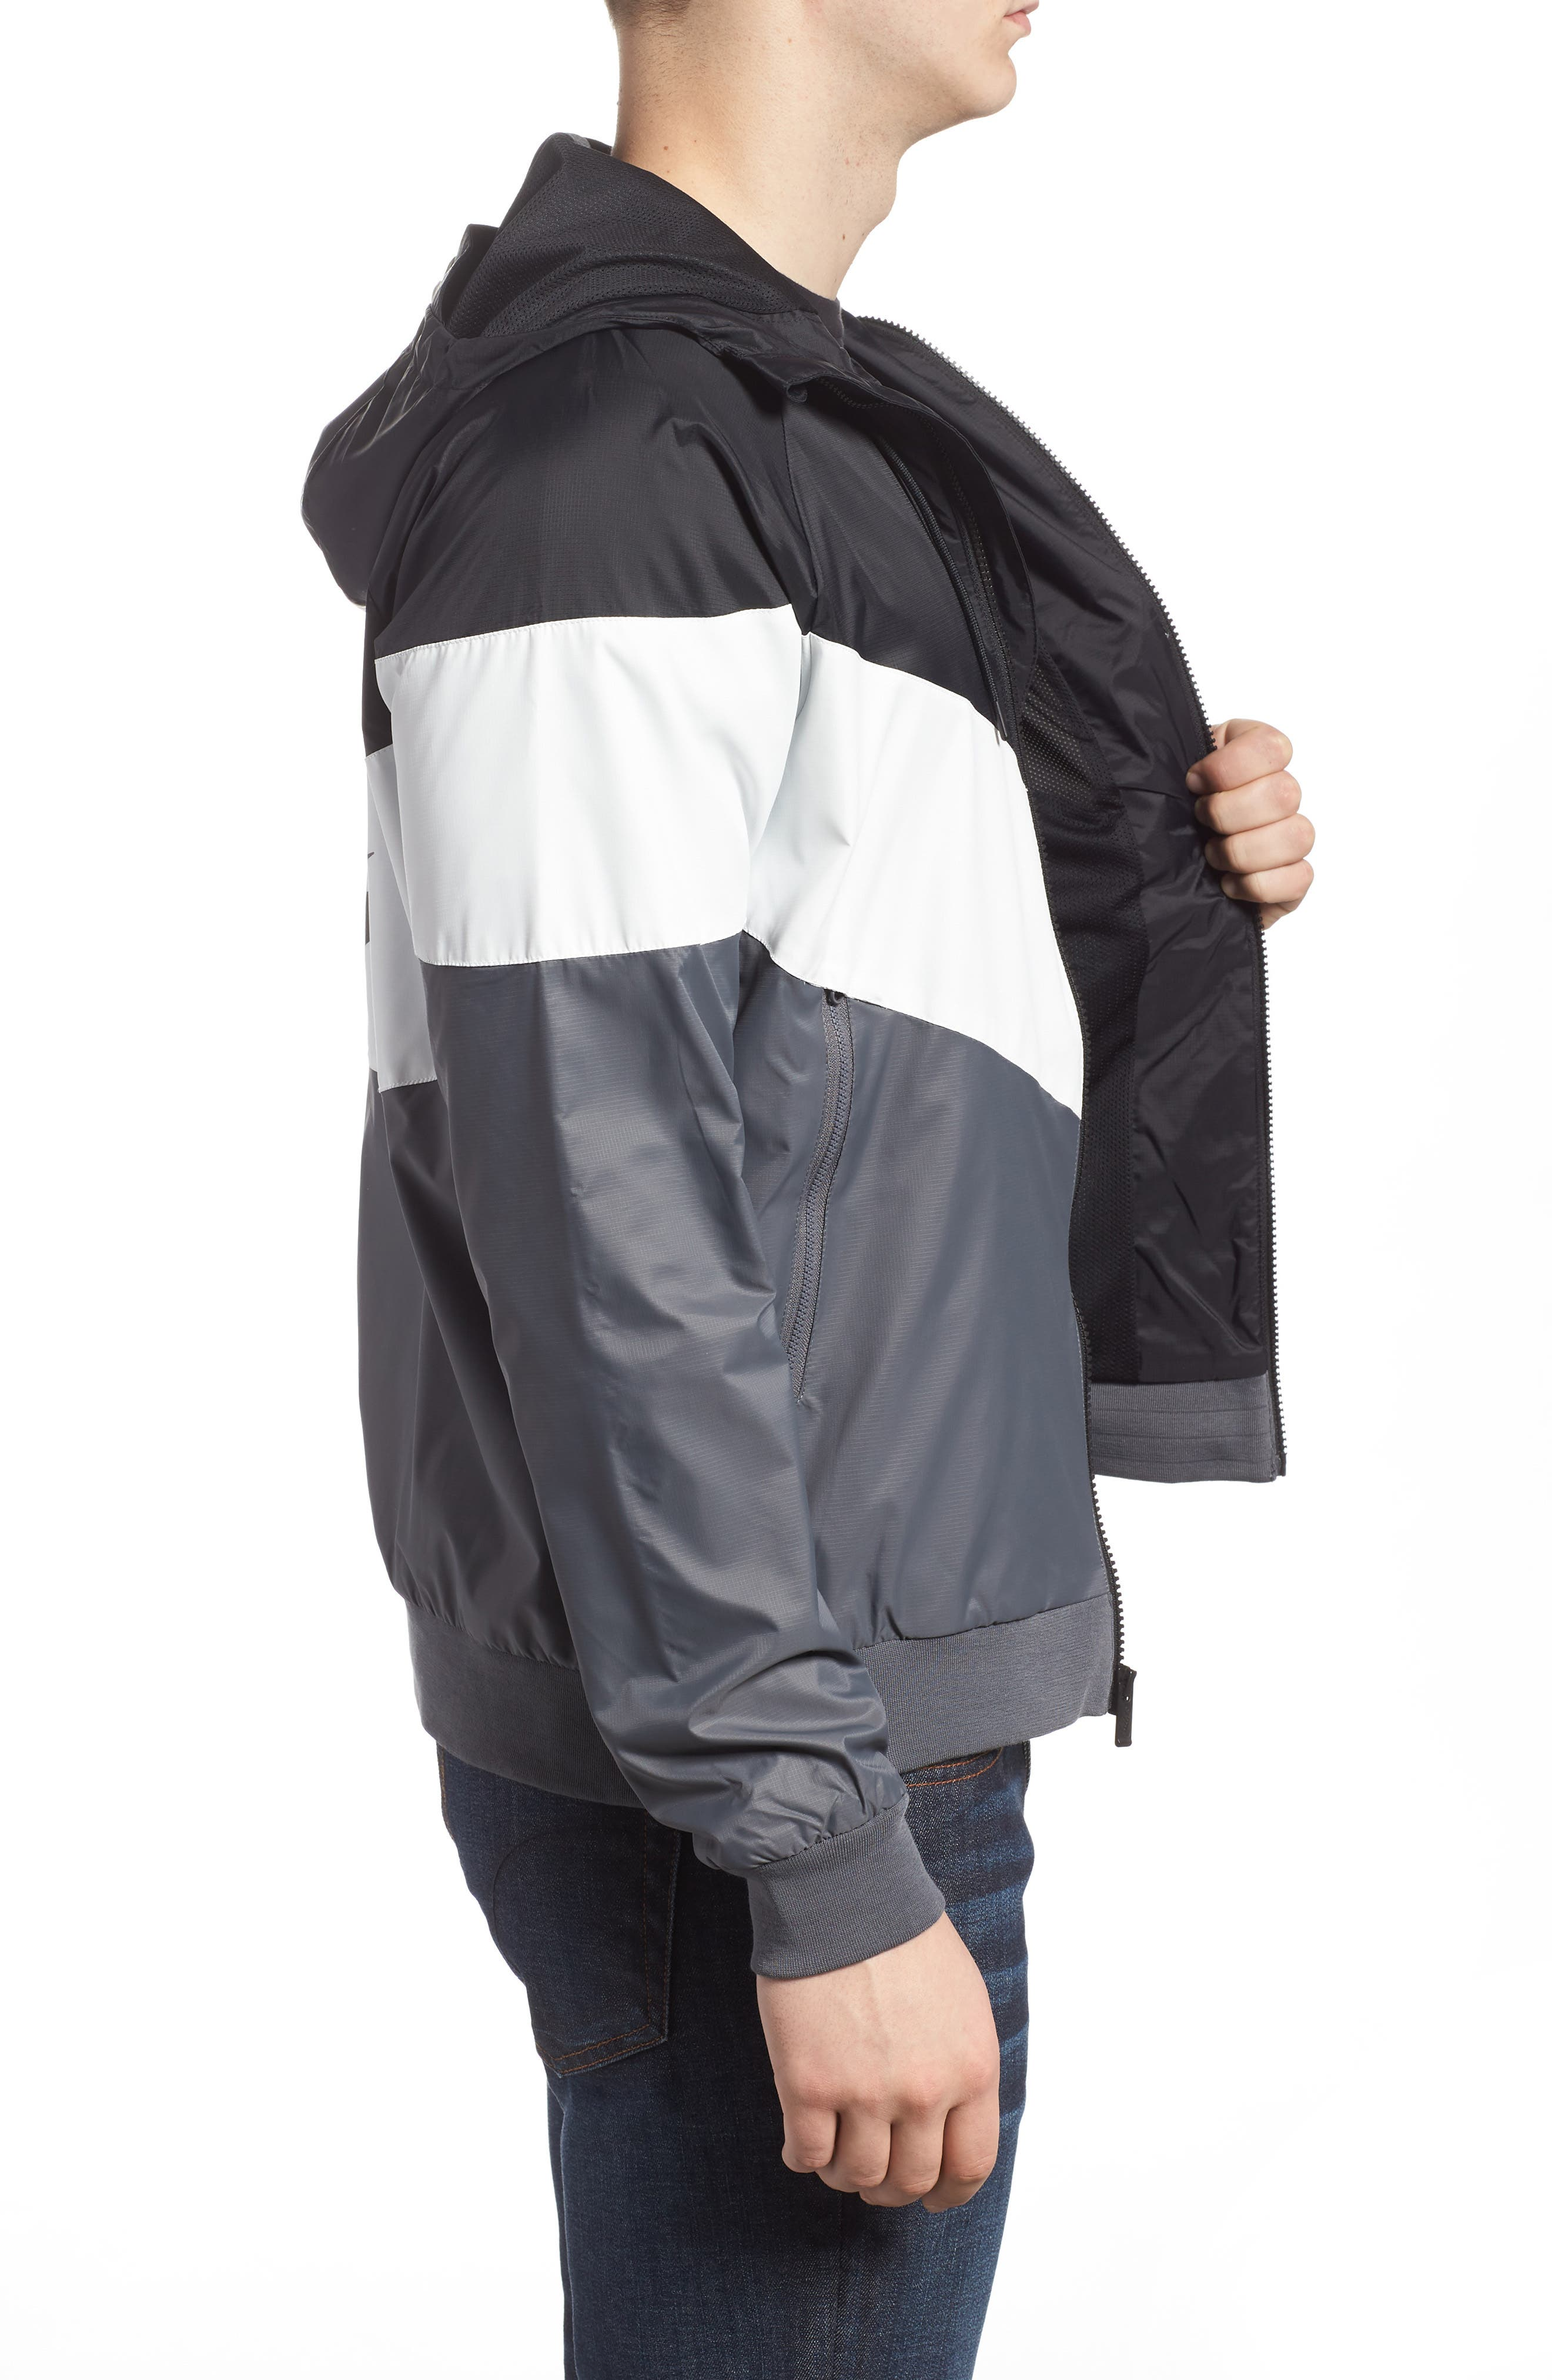 Windrunner Wind & Water Repellent Hooded Jacket,                             Alternate thumbnail 3, color,                             Black/ Summit White/ Dark Grey